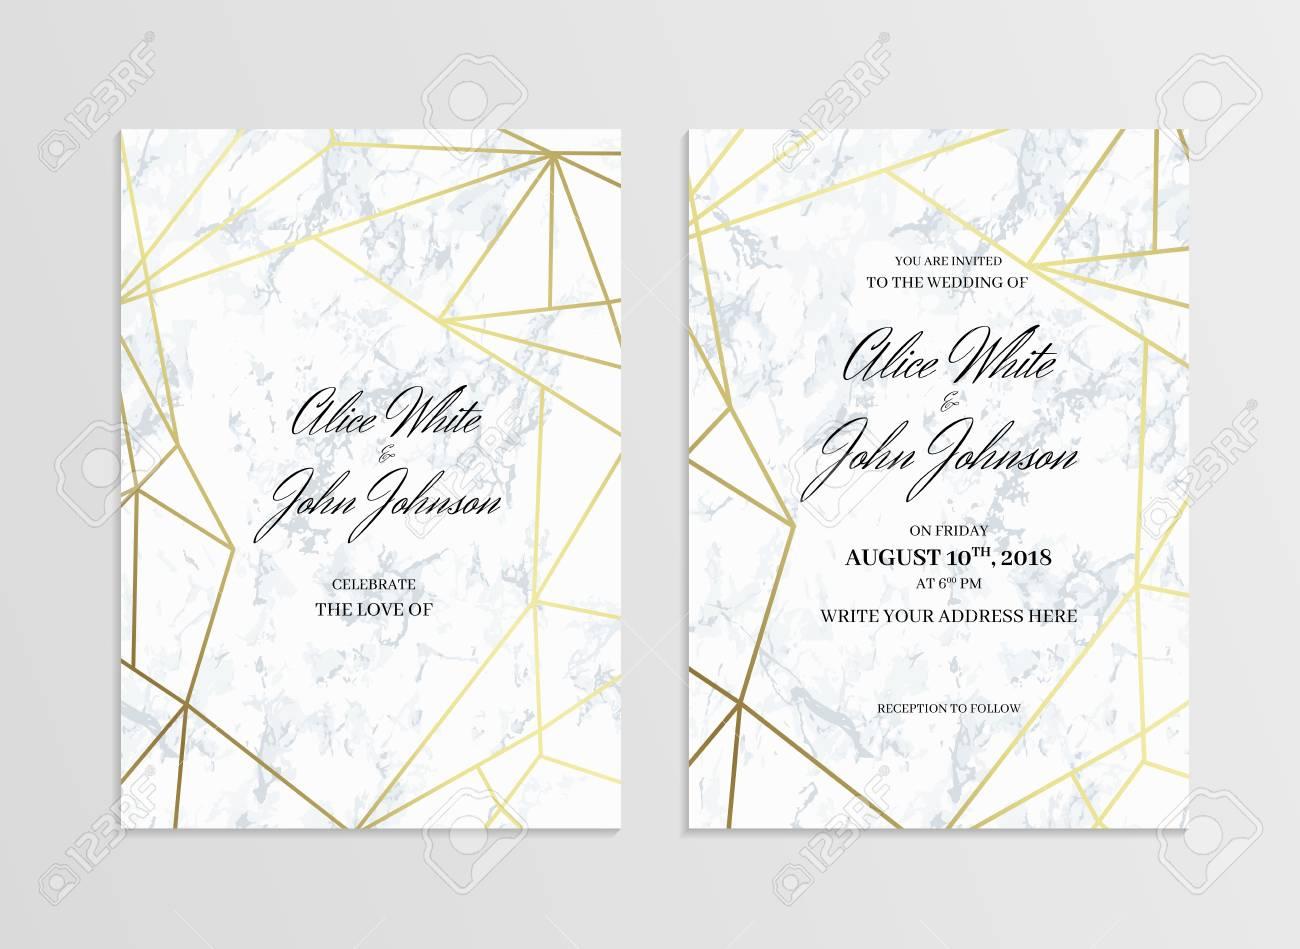 Invitation Card Template Of Geometric Design Two Side Invitation